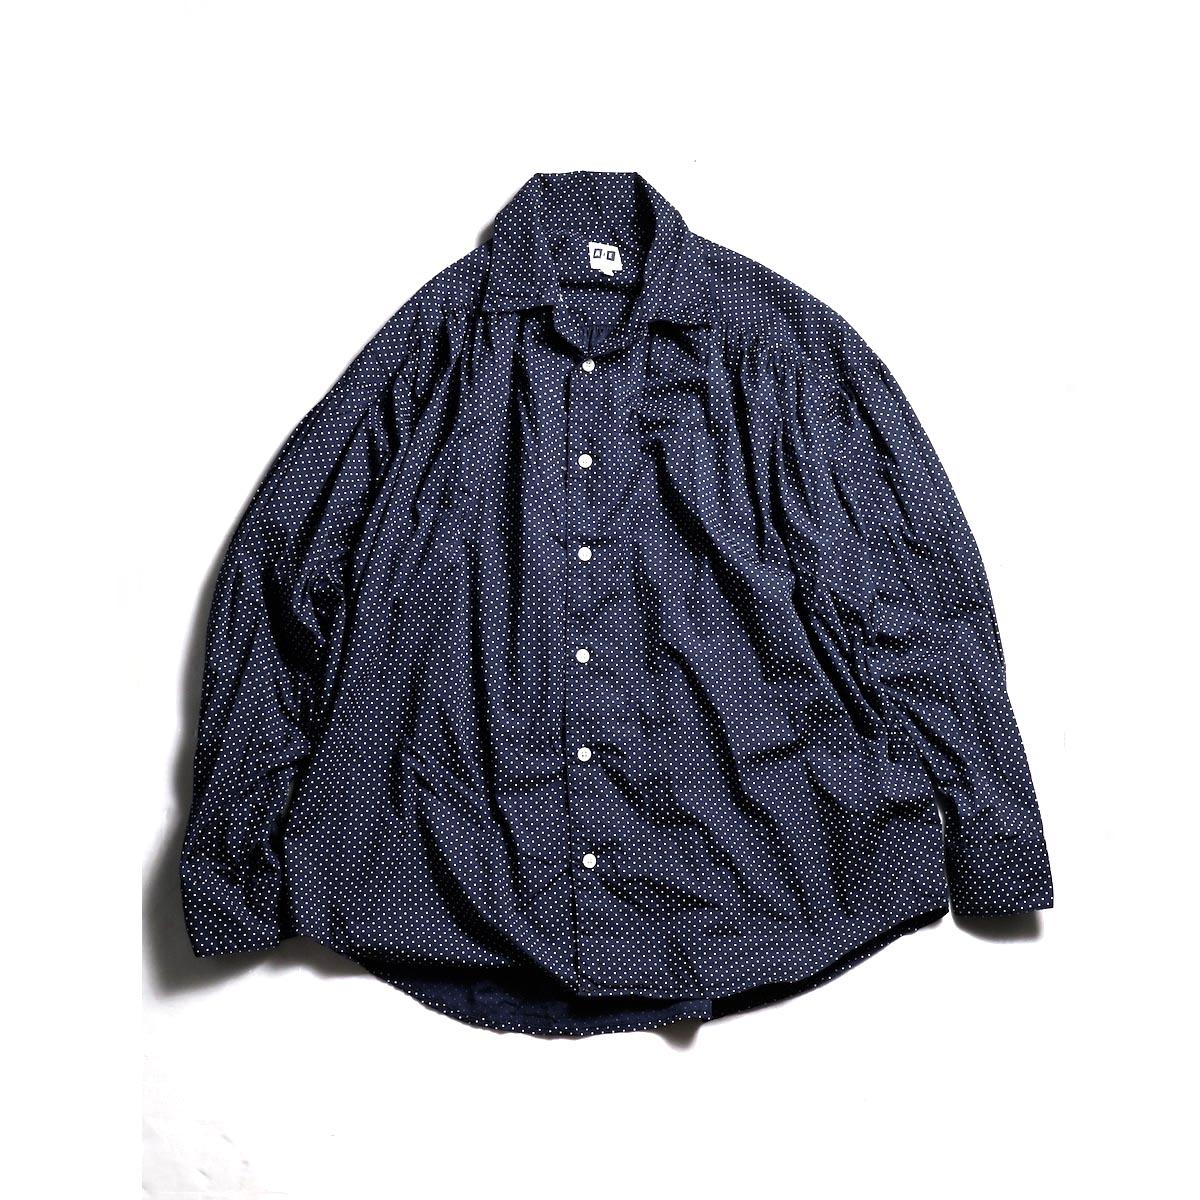 AiE / Painter Shirt - Small Polka Dot (White/Navy)